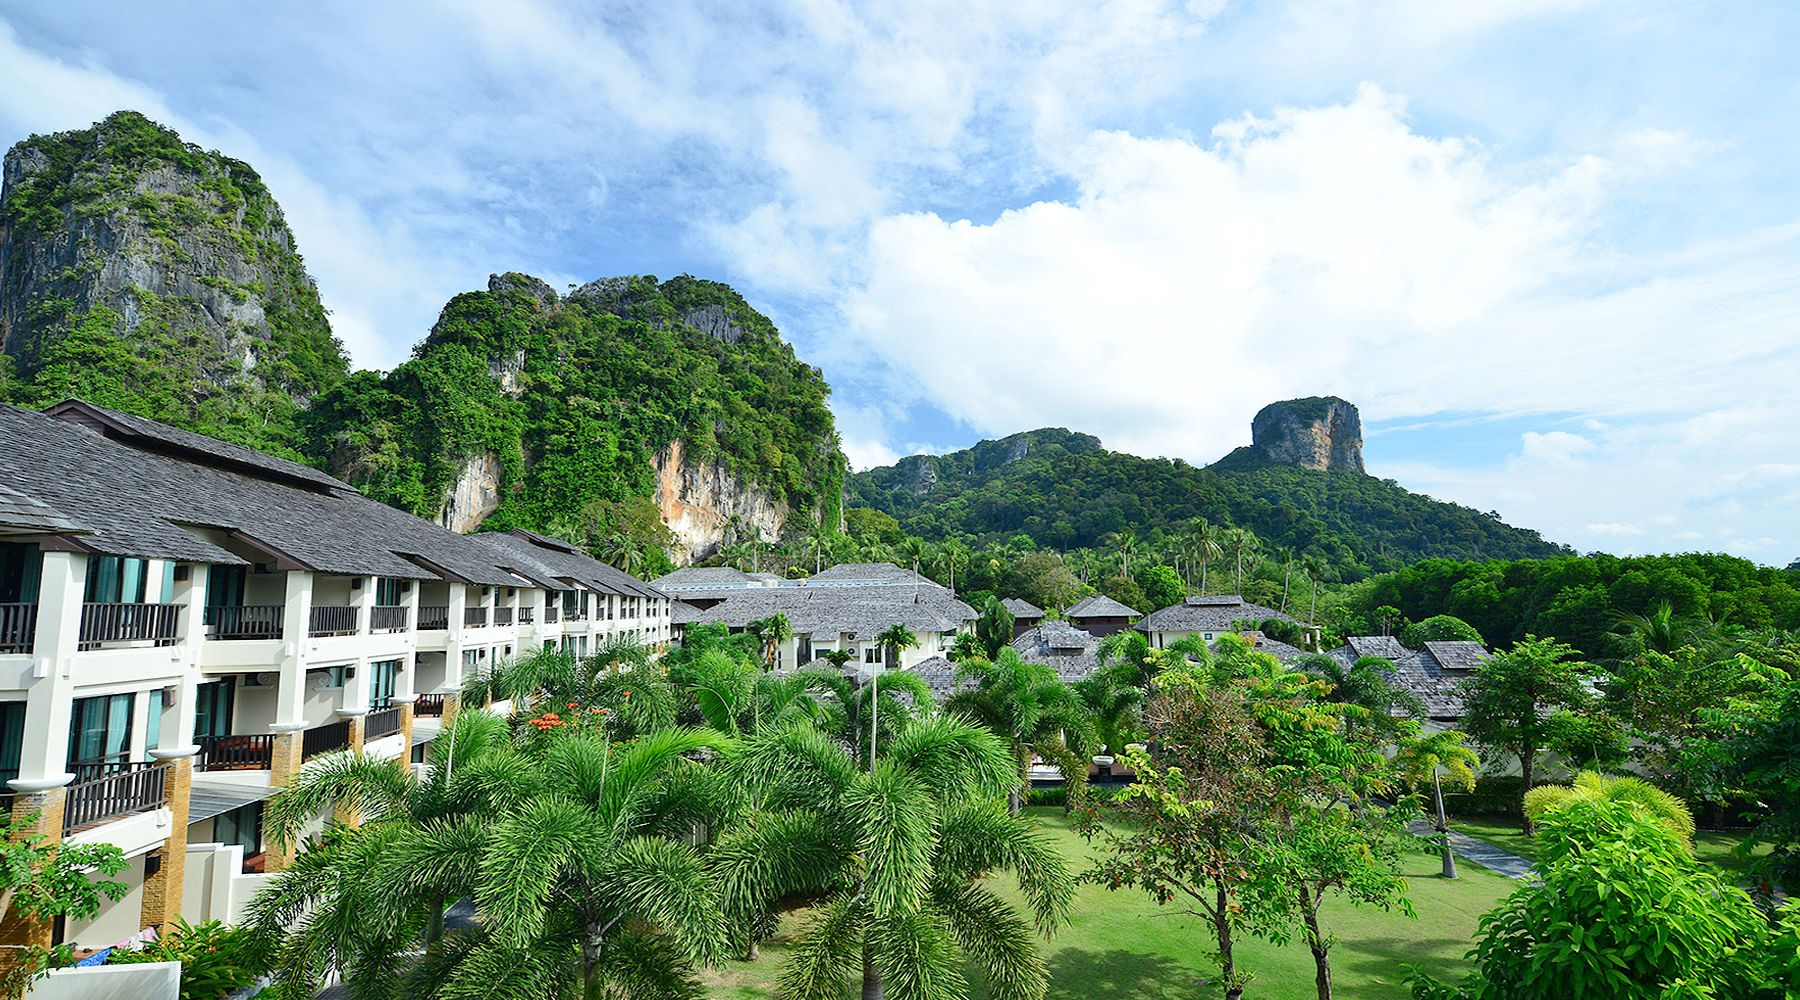 Bhu Nga Thani Resort & Spa, Railay Beach